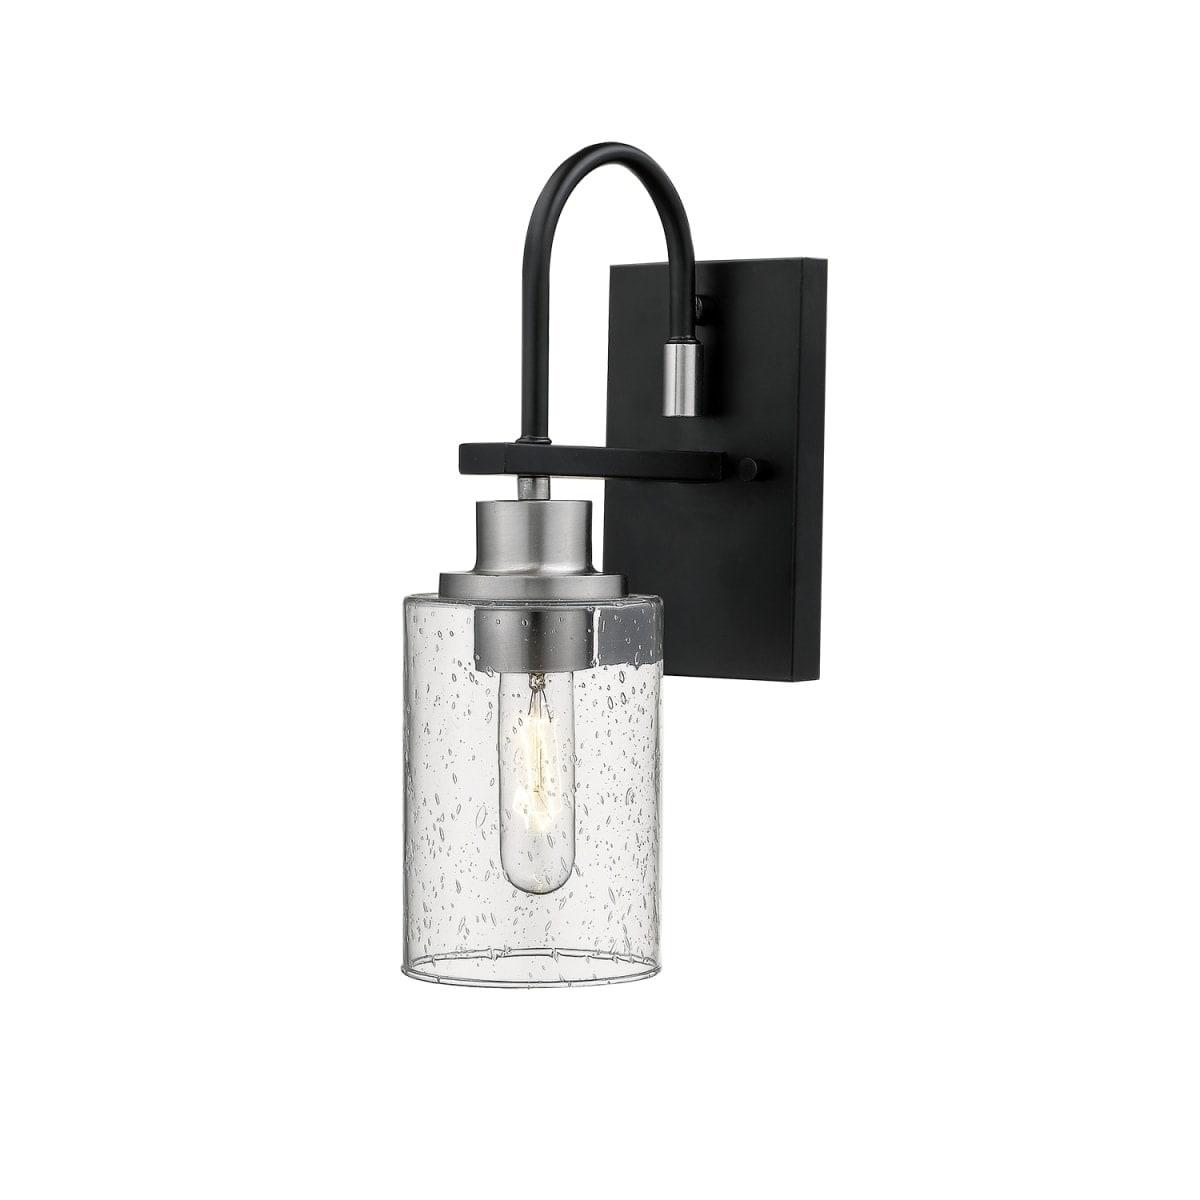 Image of: Shop Black Friday Deals On Millennium Lighting 3511 Clifton Single Light 14 Tall Bathroom Sconce Matte Black Brushed Nickel Overstock 27382967